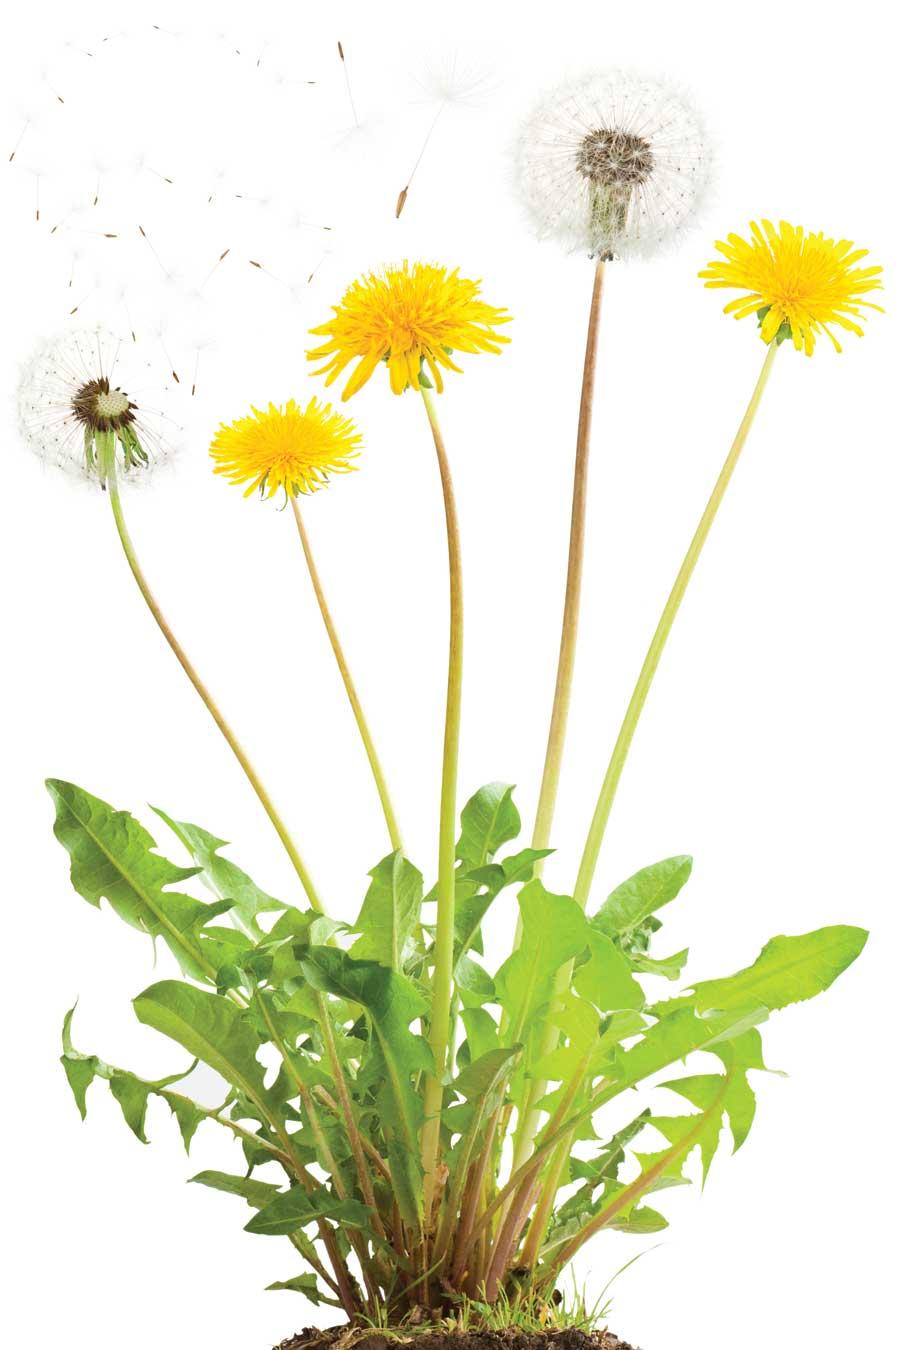 Stunning Dandelion Image